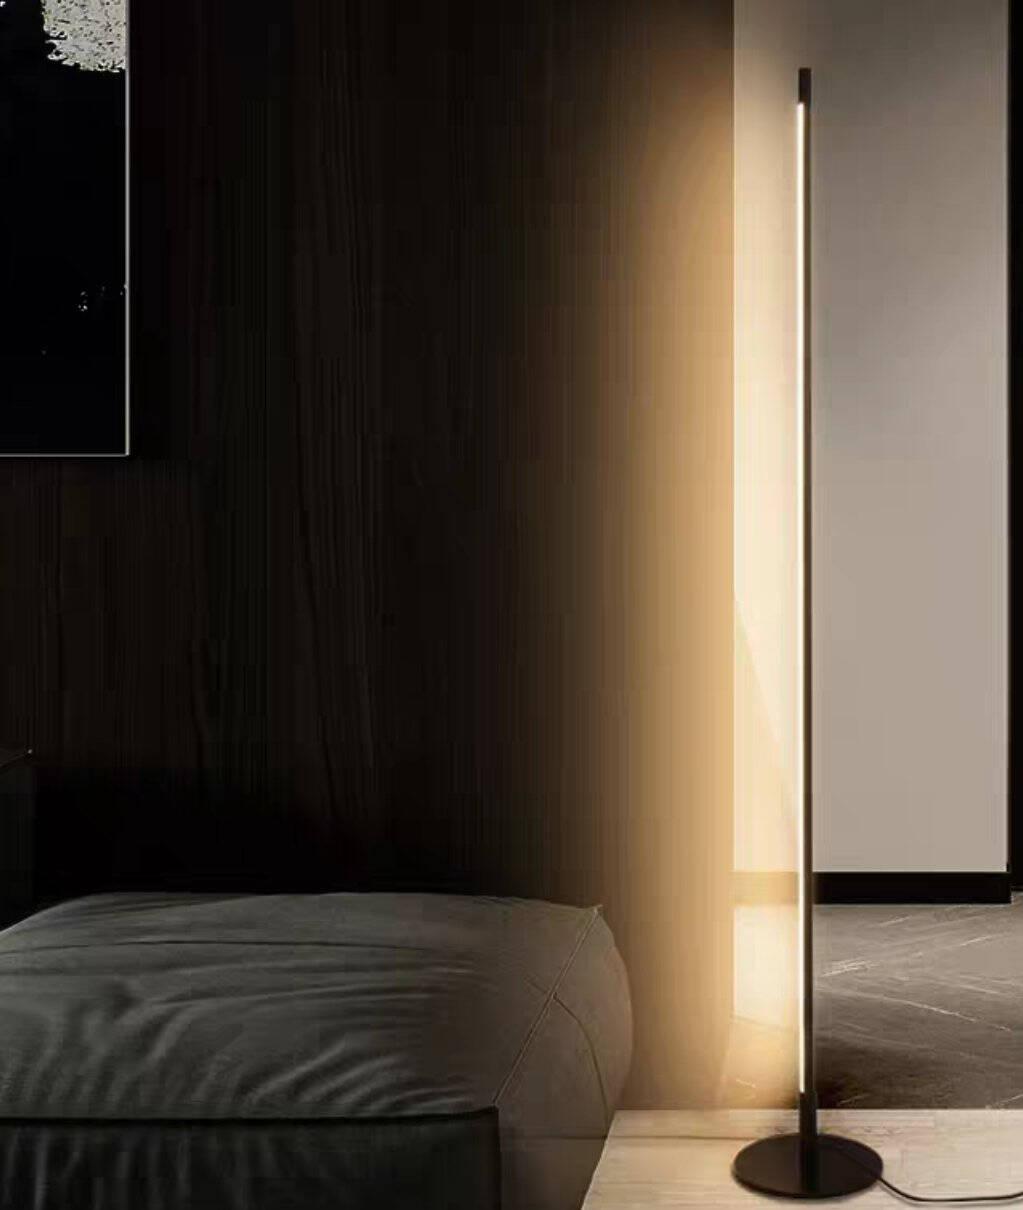 UPSHINE落地灯ins风现代简约卧室客厅个性极简创意氛围灯立式床头落地灯遥控版-含底座